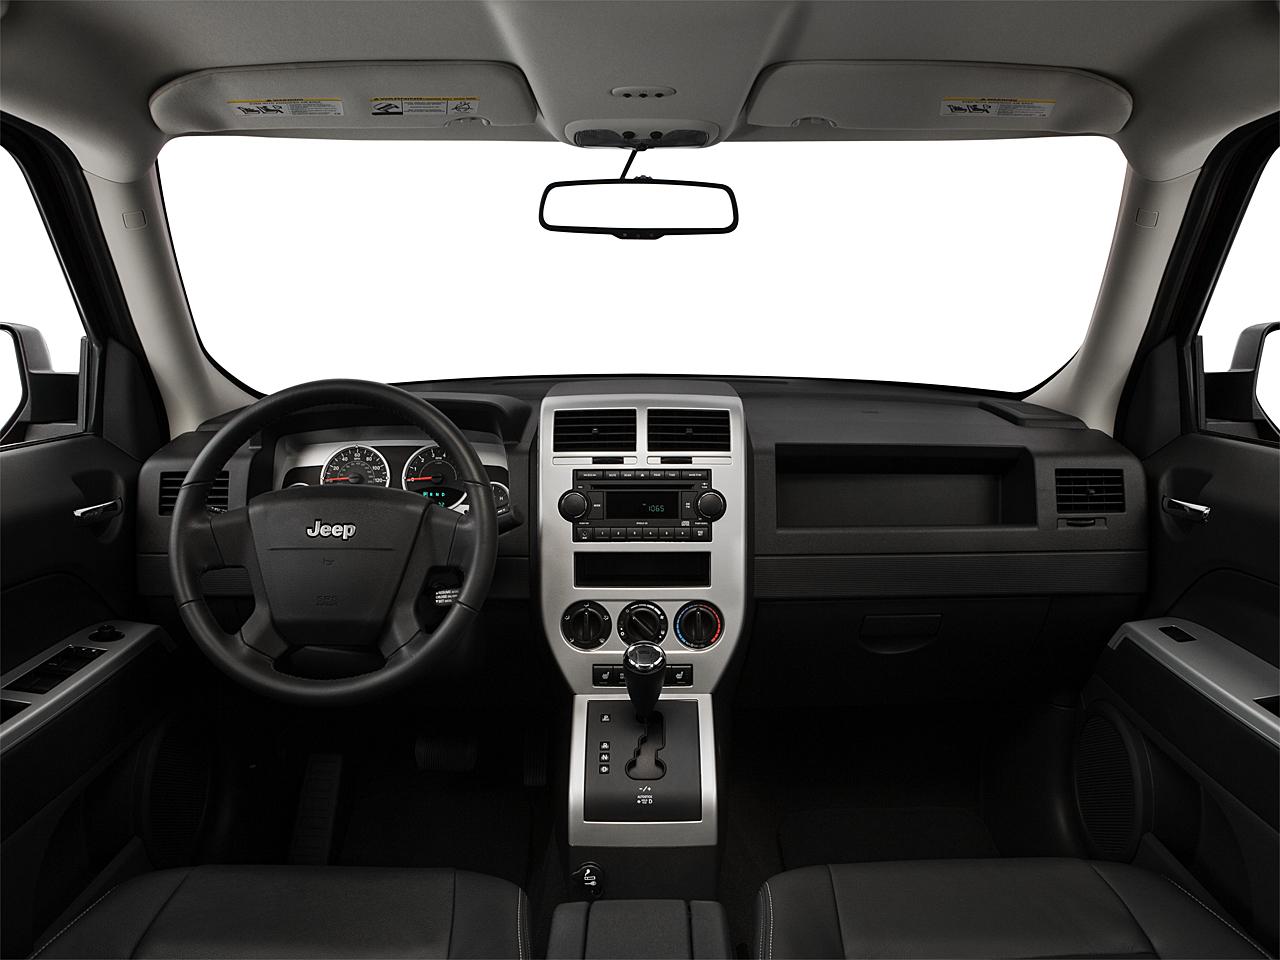 2008 Jeep Patriot Limited, Centered Wide Dash Shot